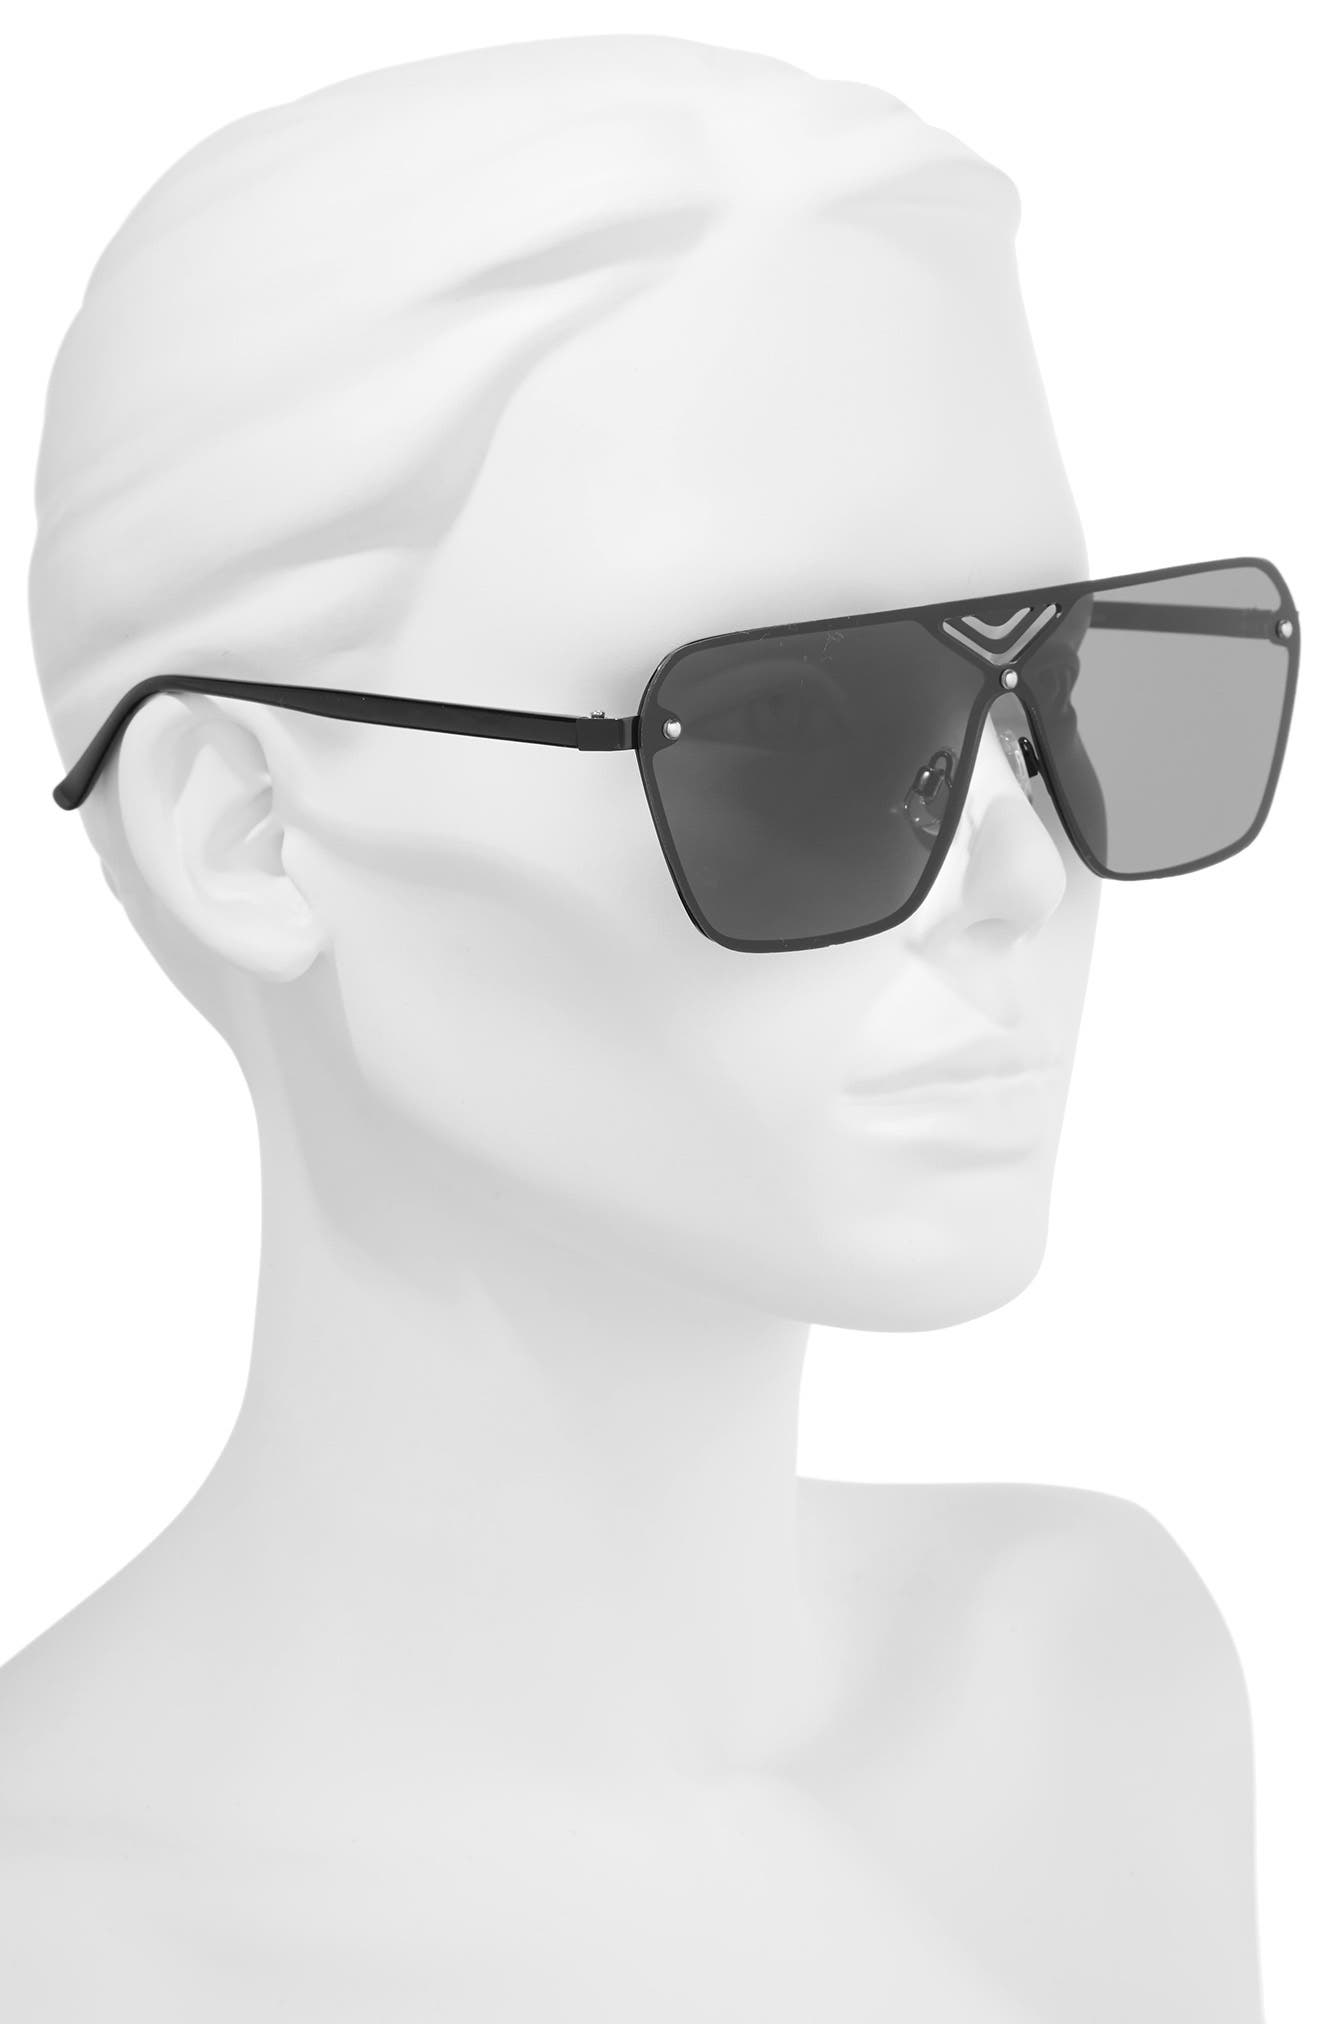 70mm Cutout Shield Sunglasses,                             Alternate thumbnail 2, color,                             Black